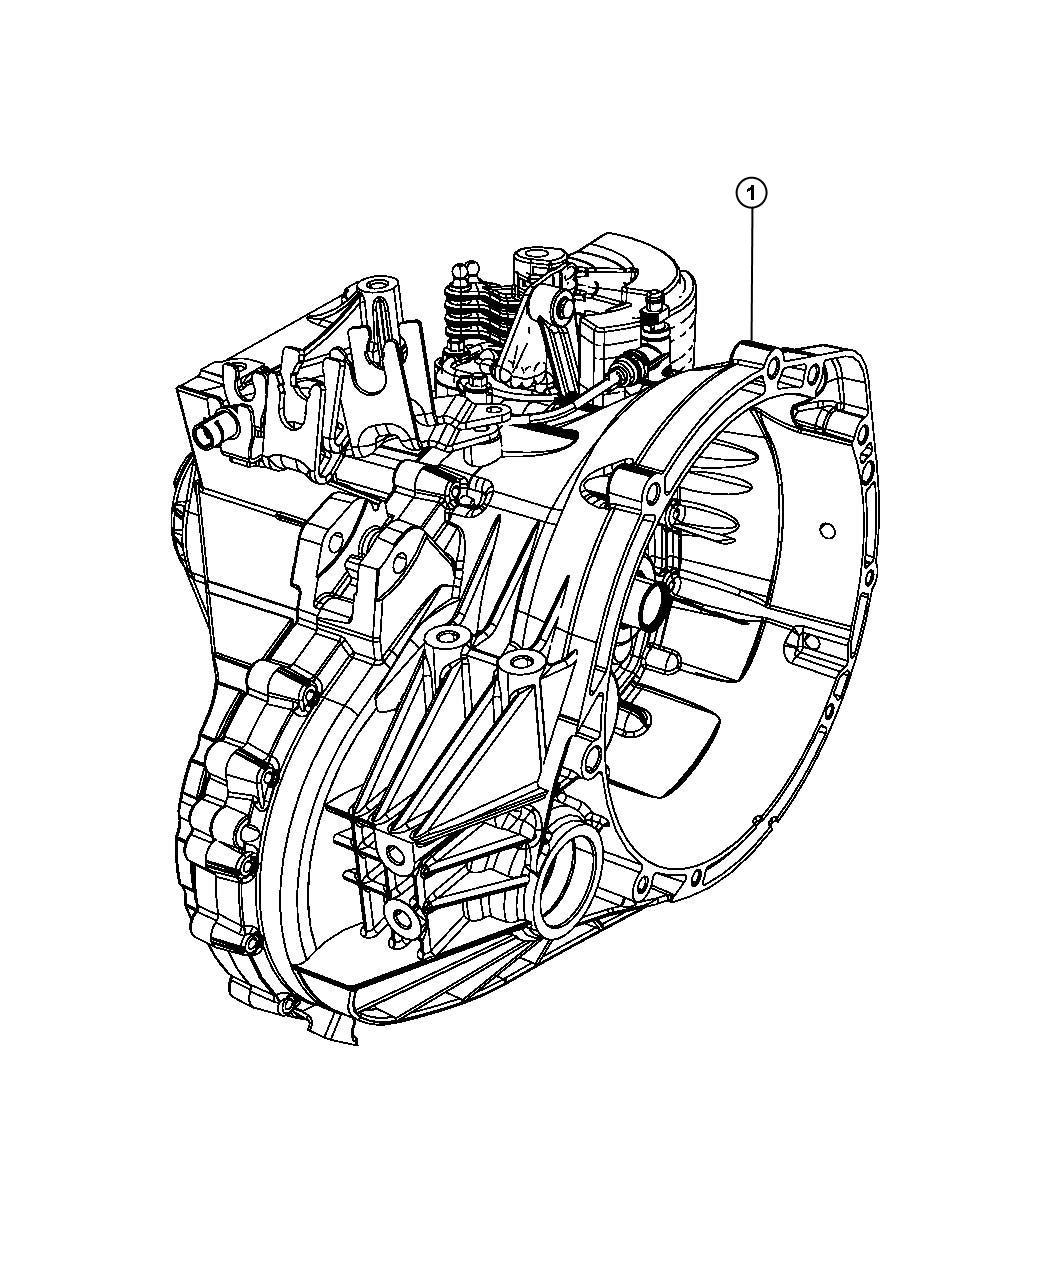 Dodge Caliber Trans Transmission Transaxle